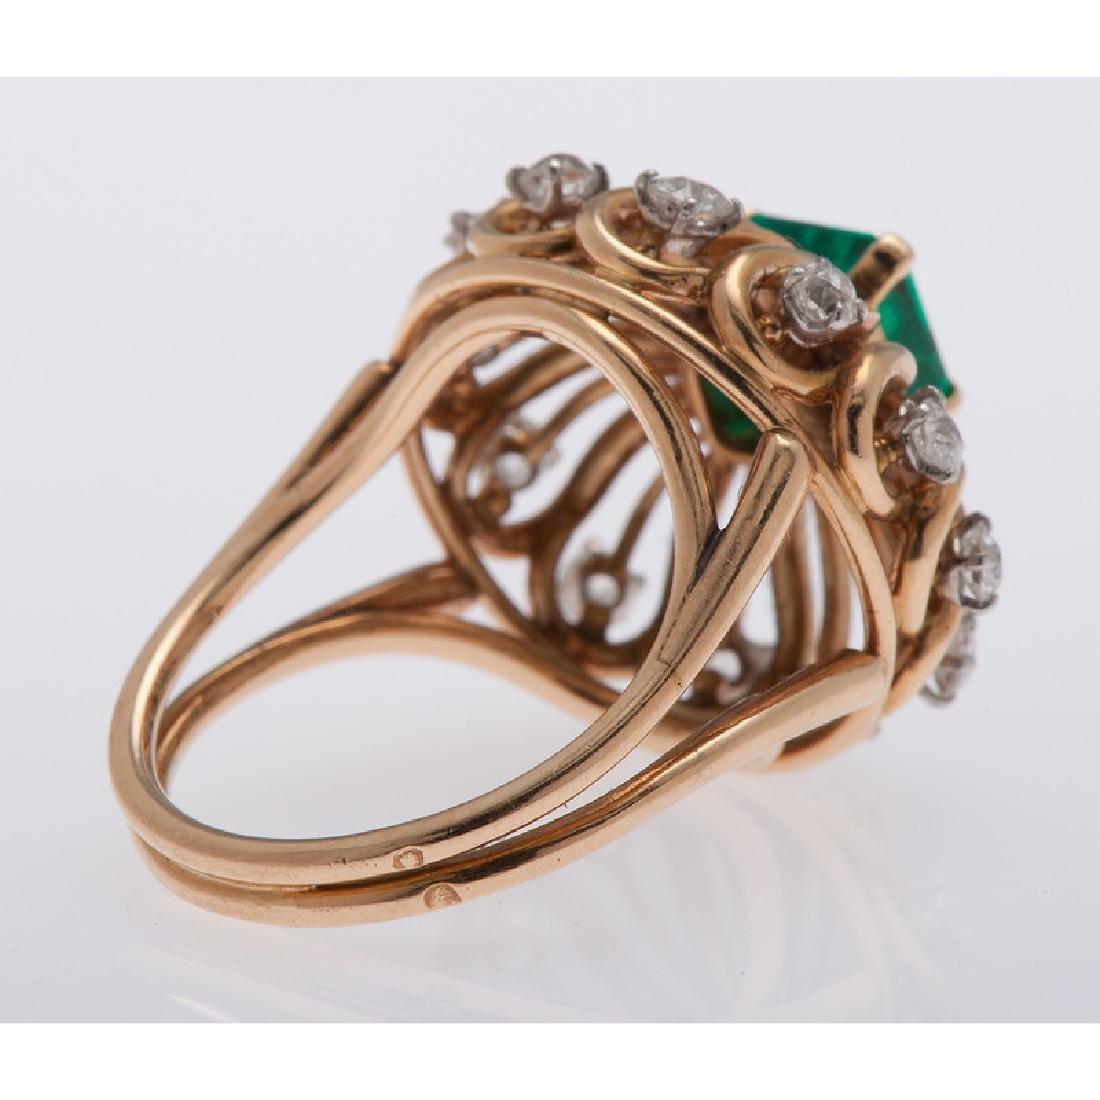 Mellerio 18 Karat Yellow Gold Emerald and Diamond Ring - 4